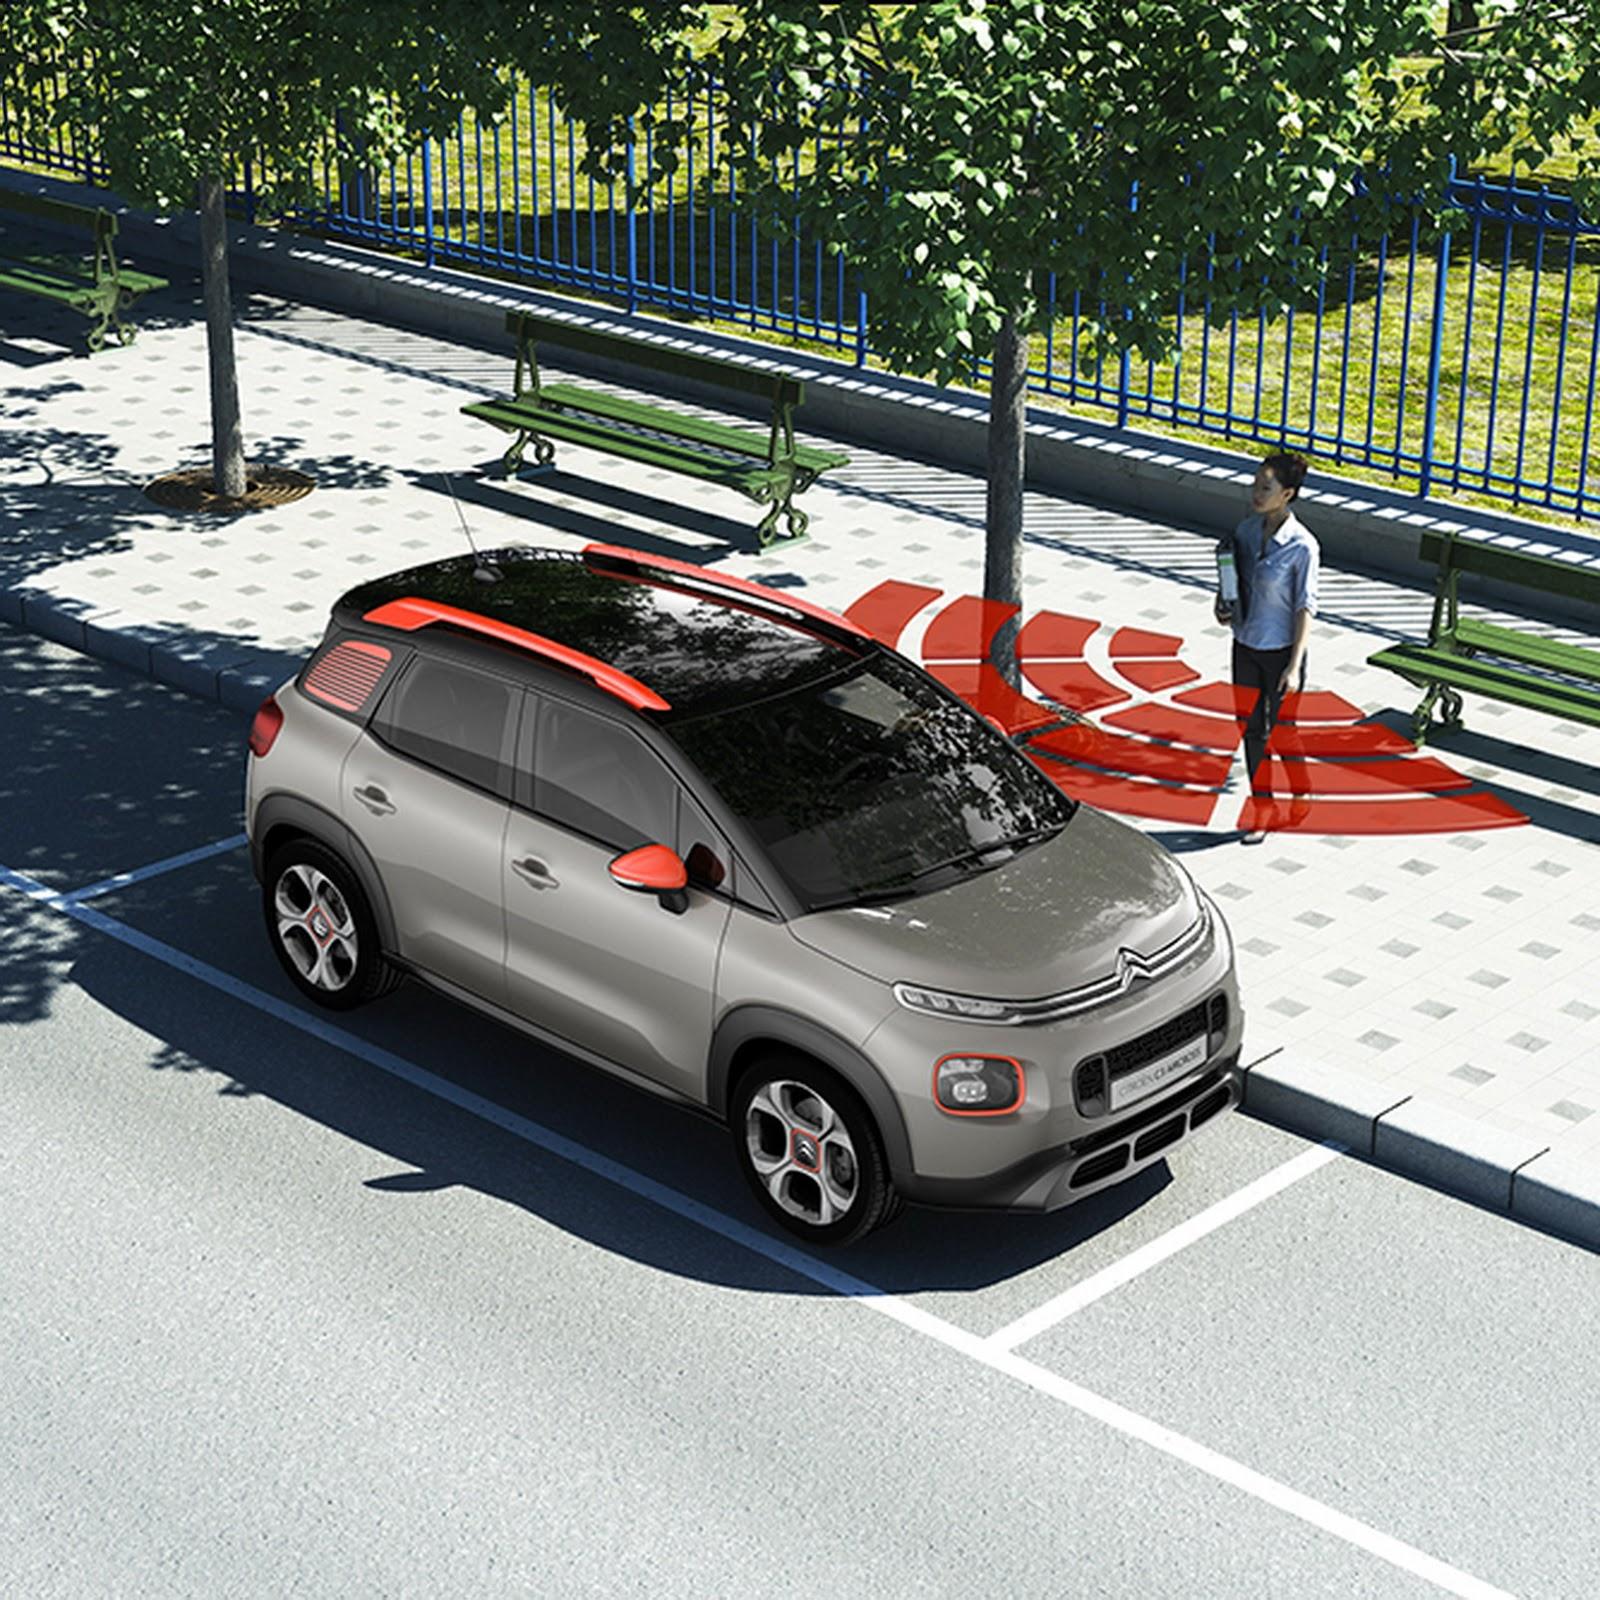 citroen presents c3 picasso replacing c3 aircross autoevolution. Black Bedroom Furniture Sets. Home Design Ideas